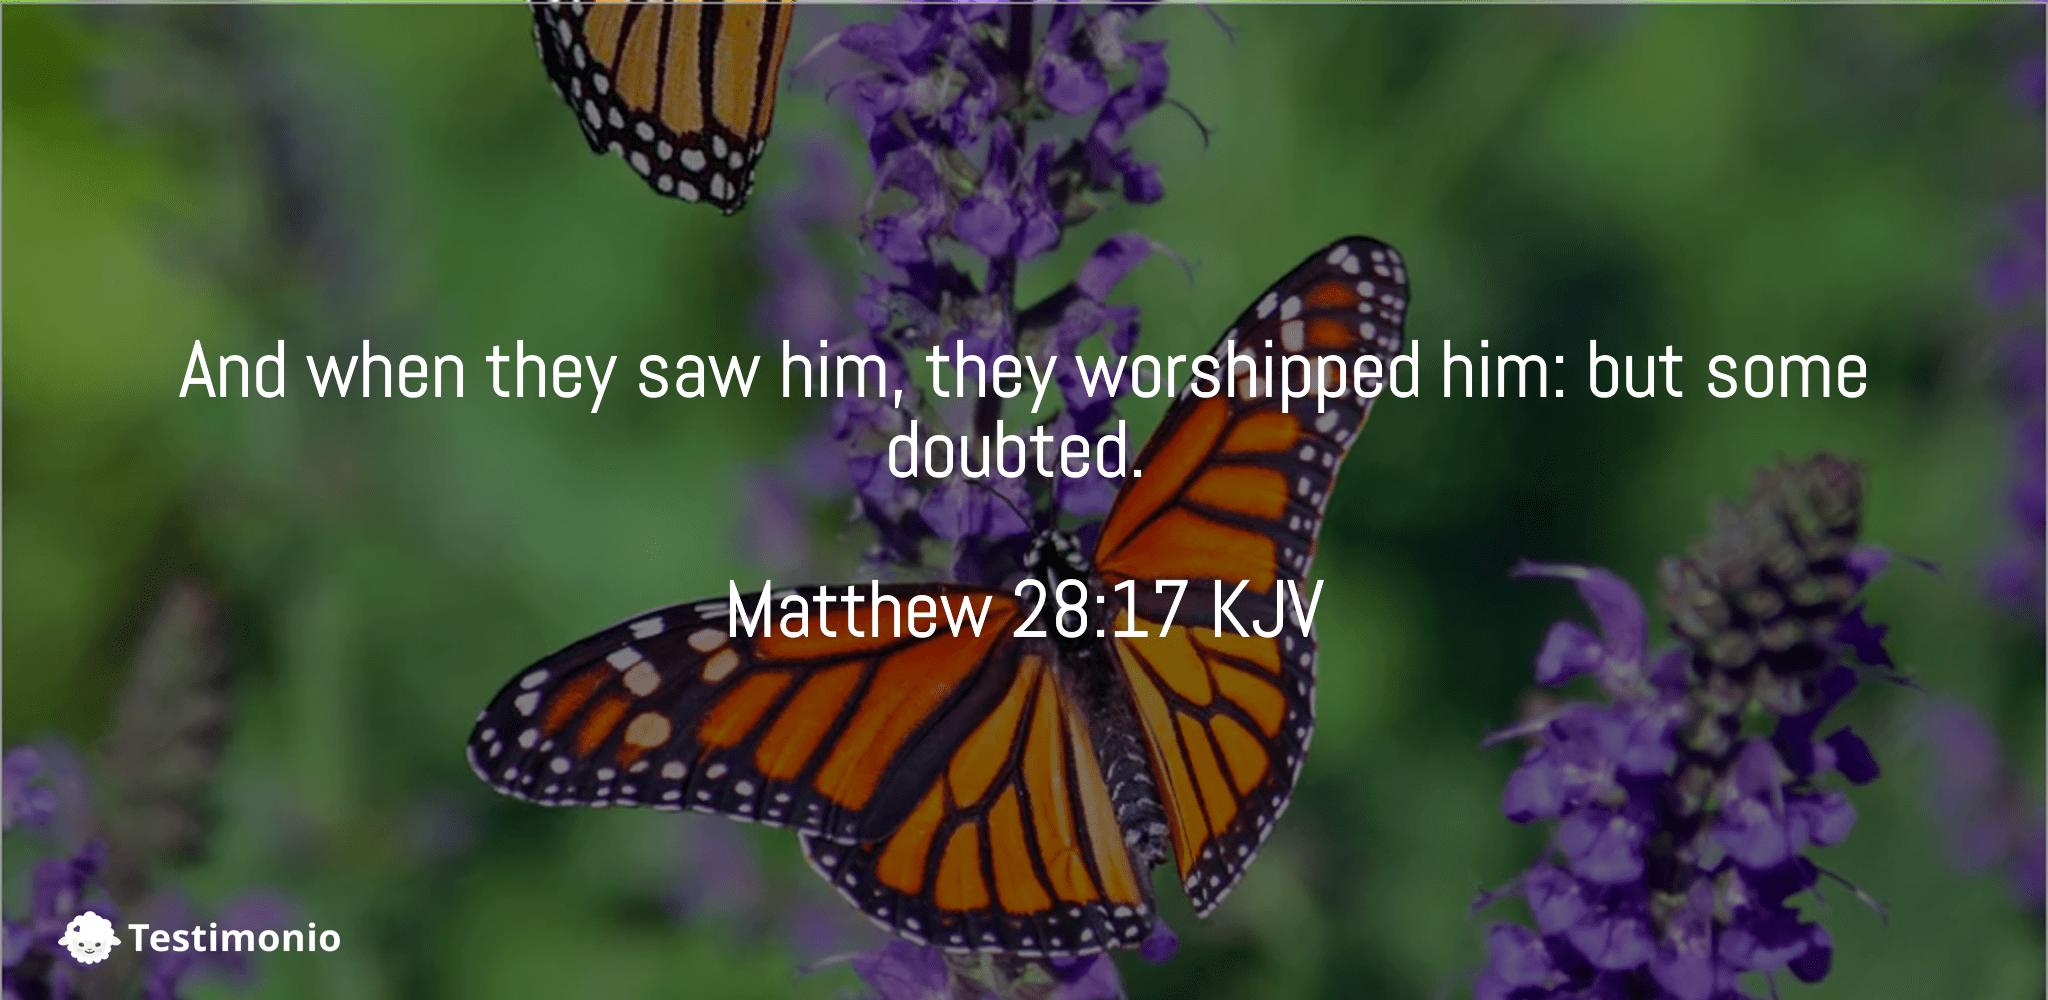 Matthew 28:17